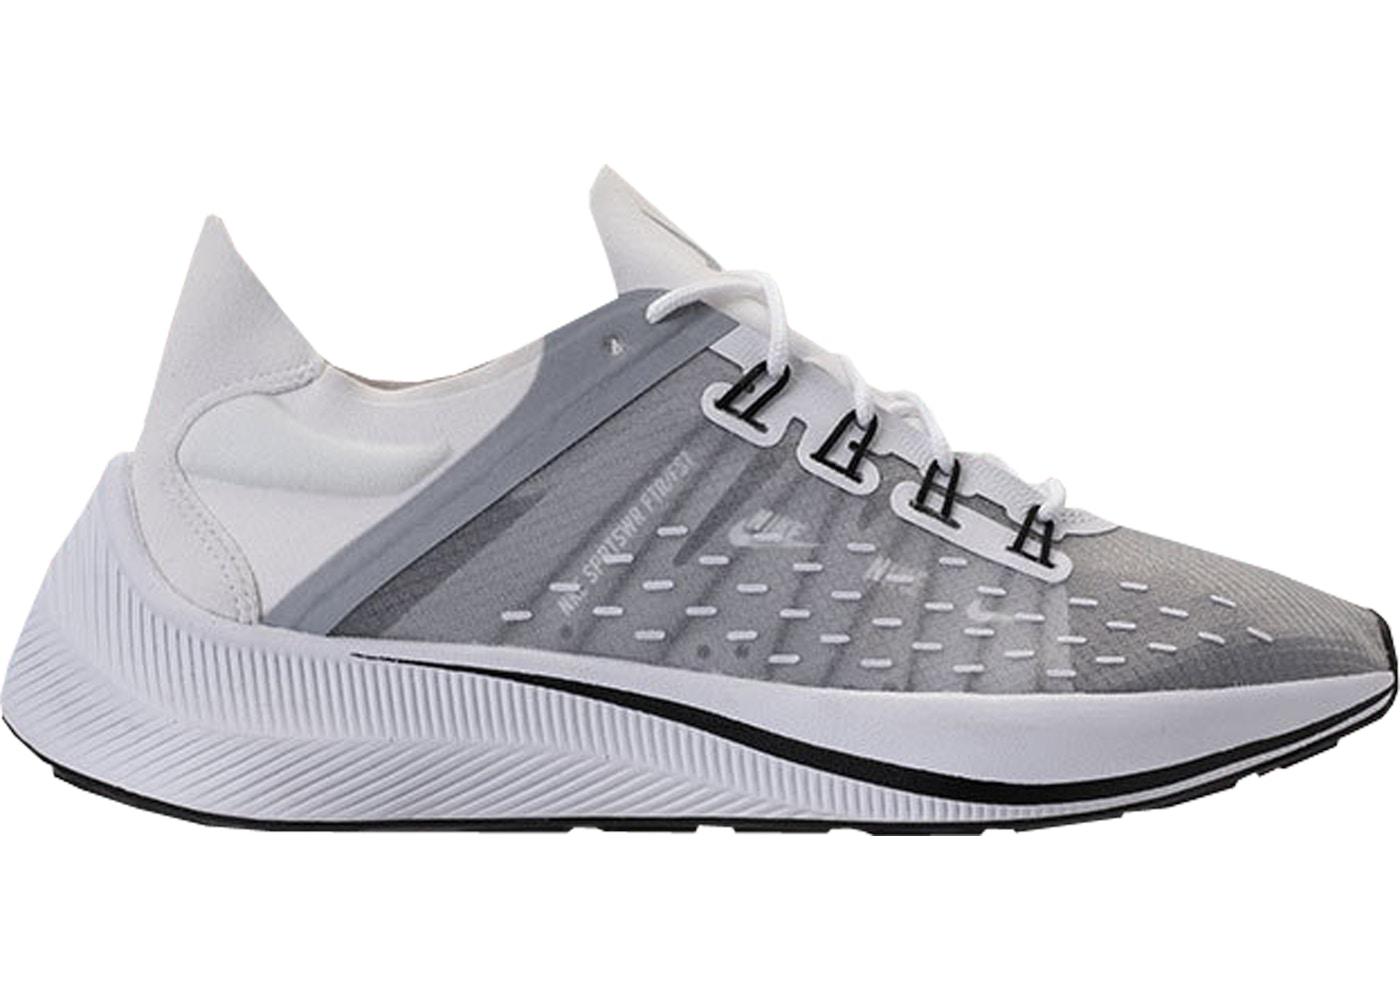 Nike EXP-X14 White Wolf Grey (W) - AO3170-100 0817a572d